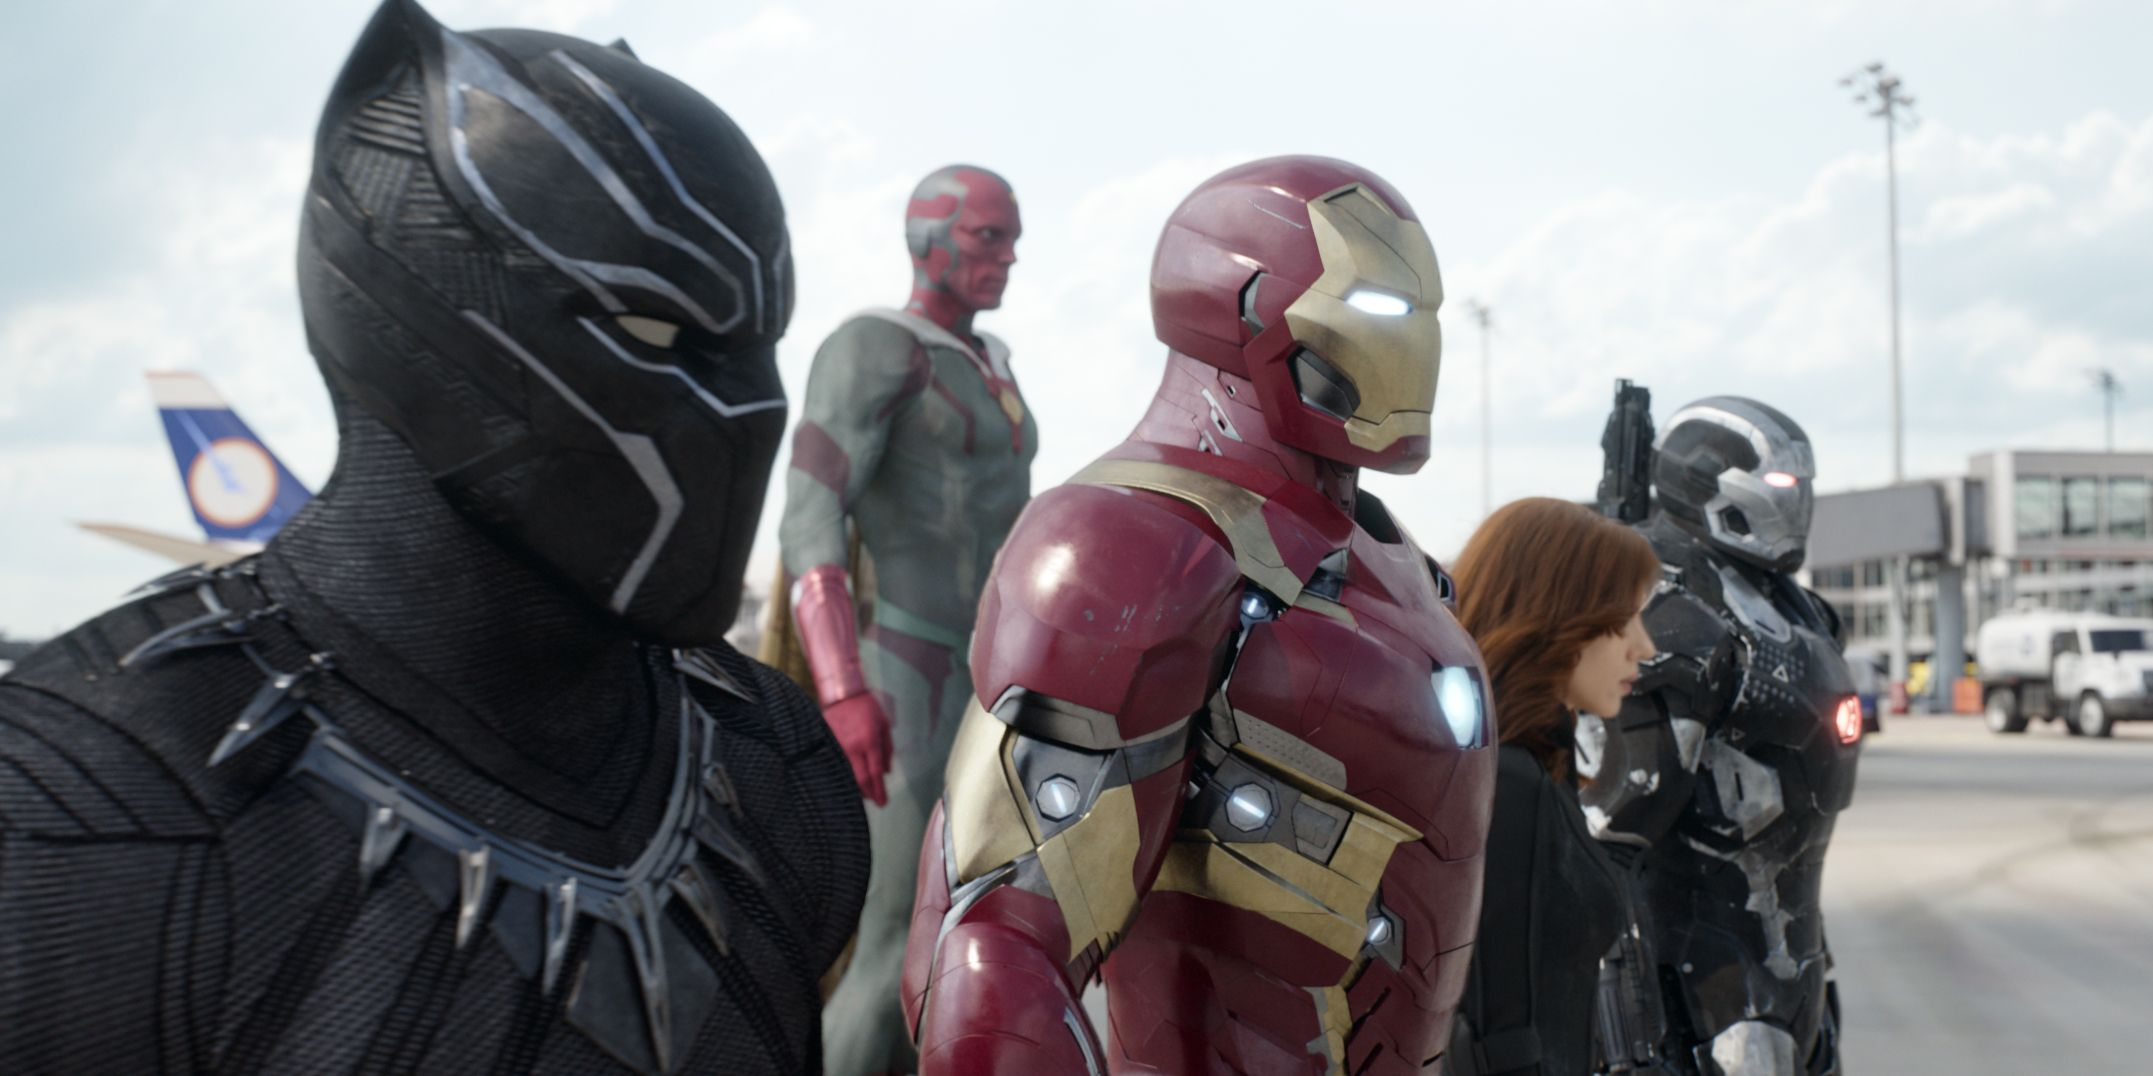 Black Panther Vision Iron Man Black Widow War Machine Captain America: Civil War airport fight scene